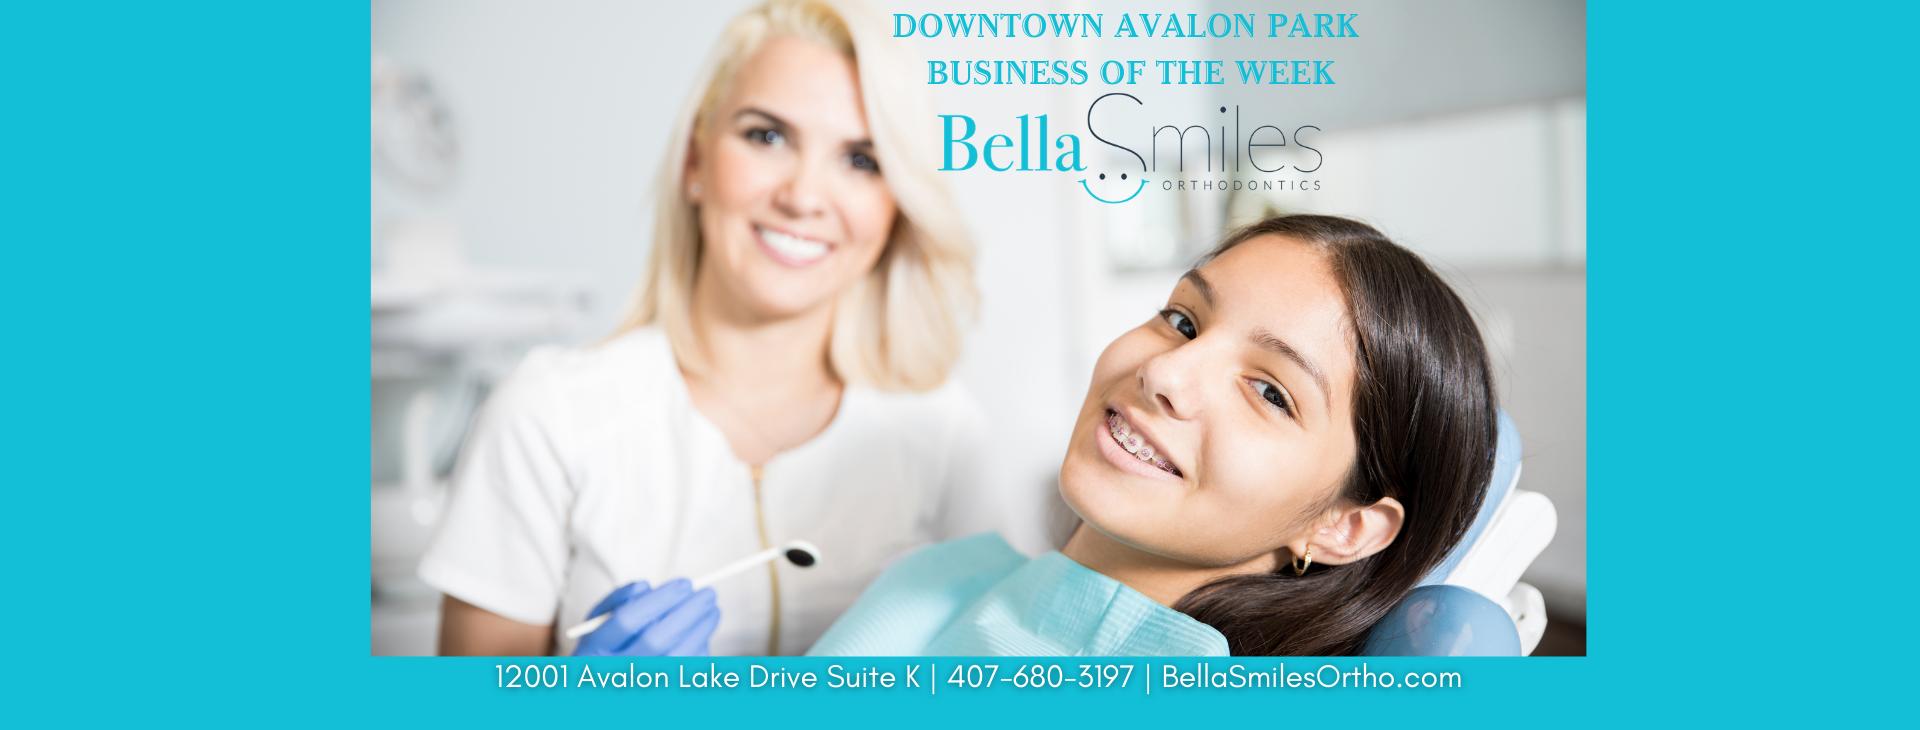 Bella Smiles FB Header